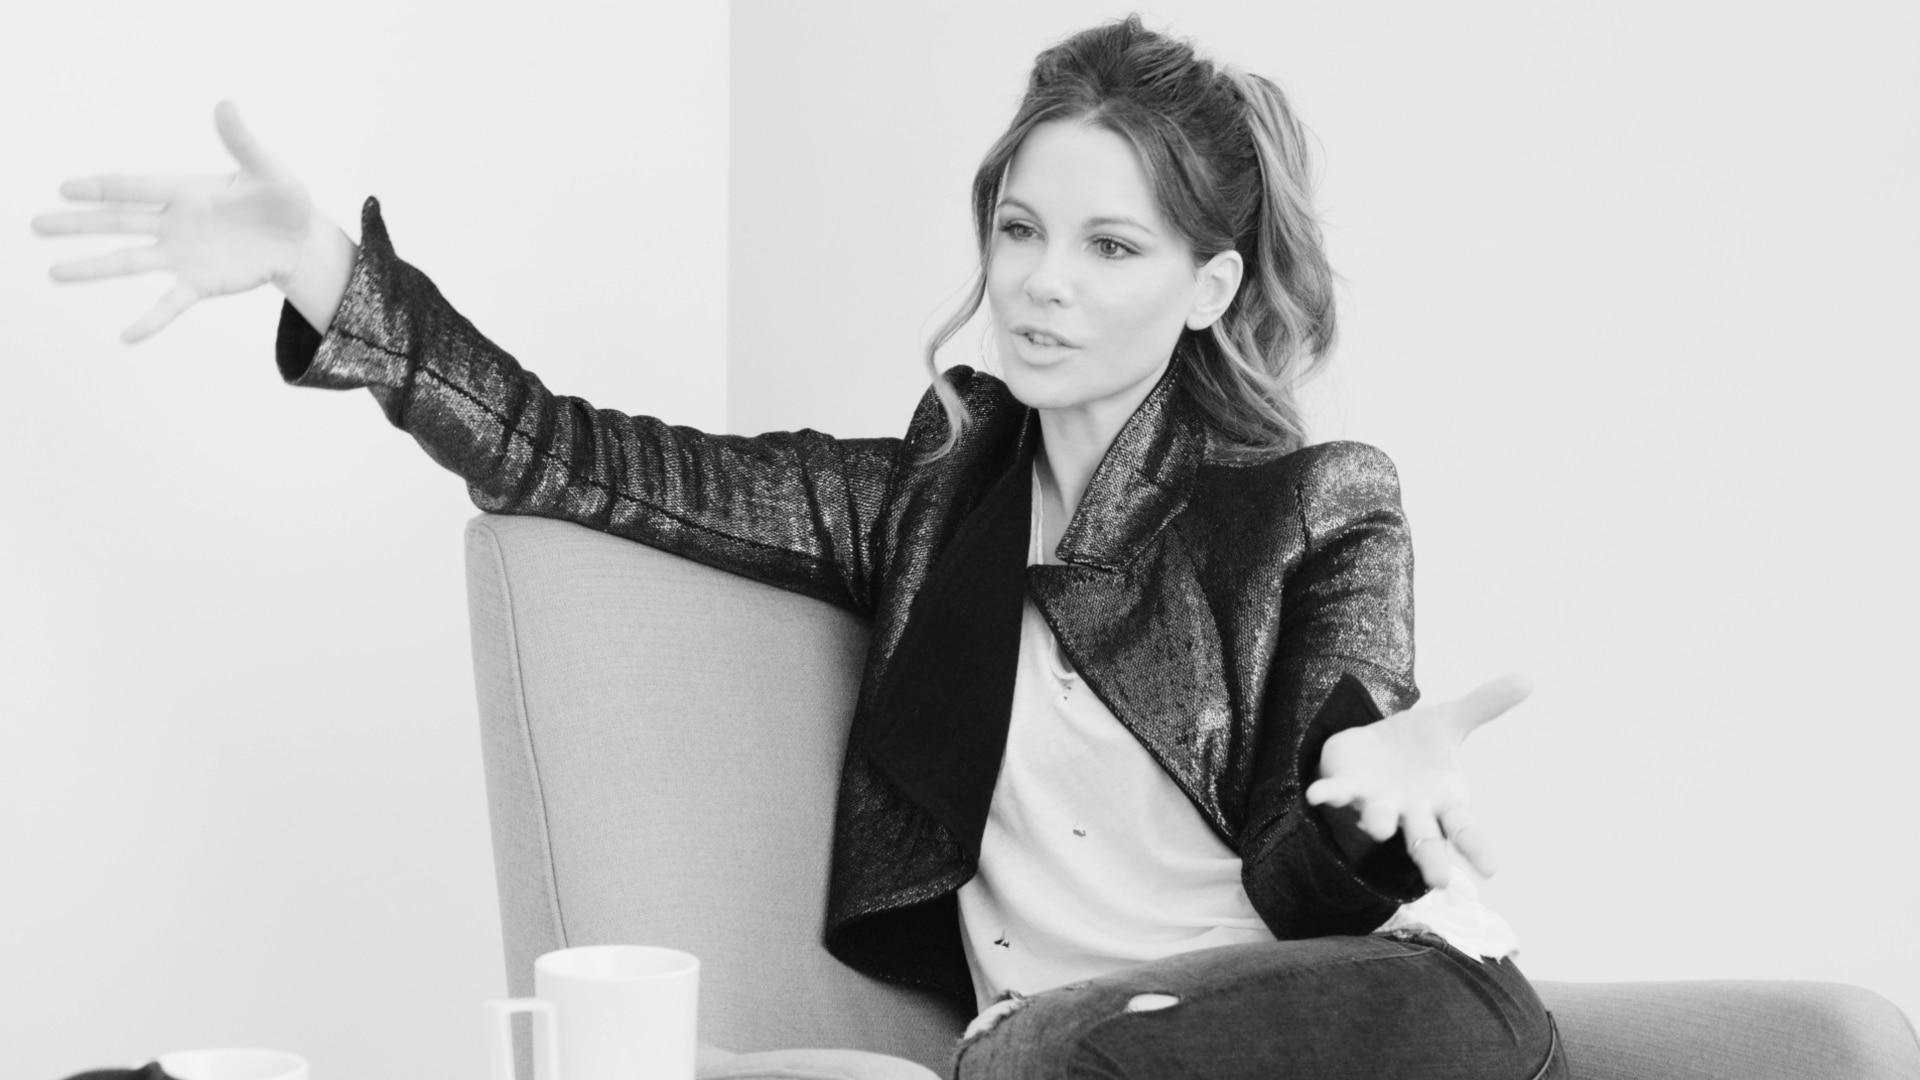 Kate Beckinsale: Off Camera With Sam Jon